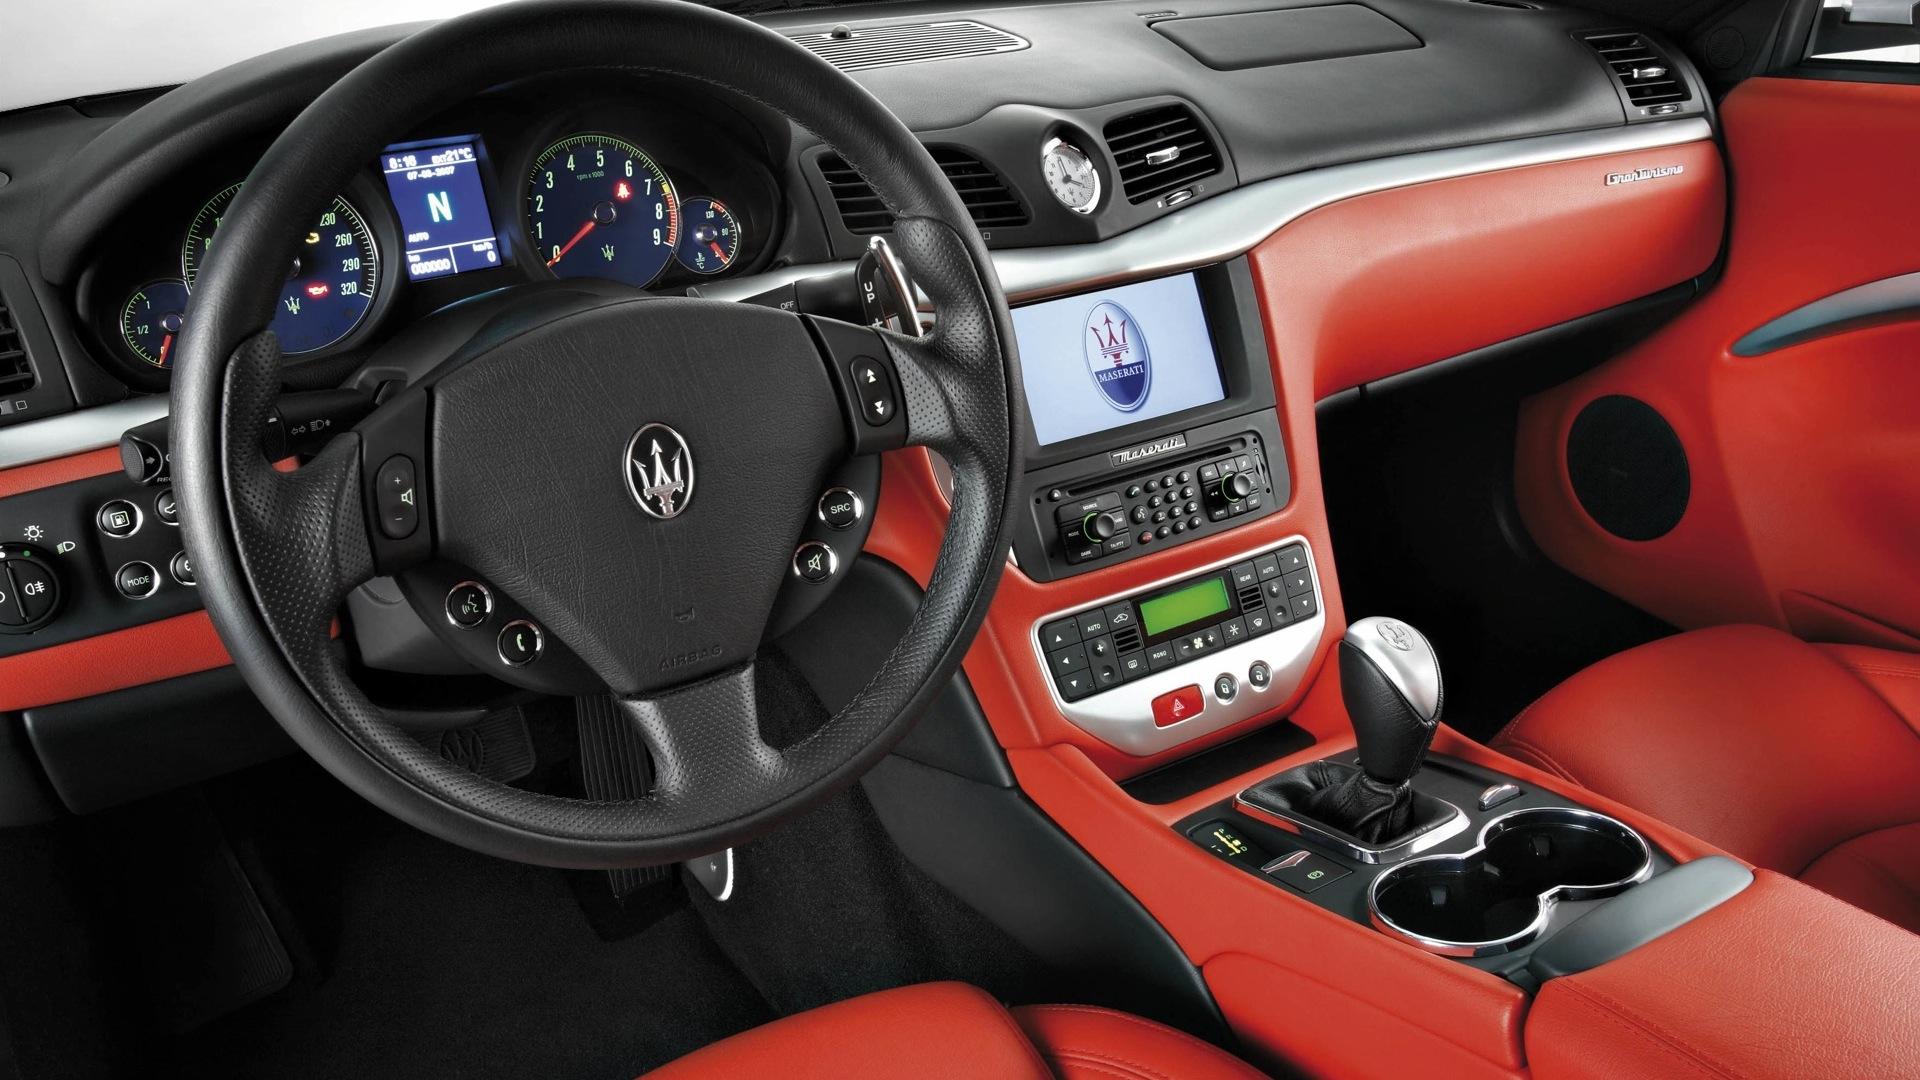 Maserati-granturismo-2013-STD Interior